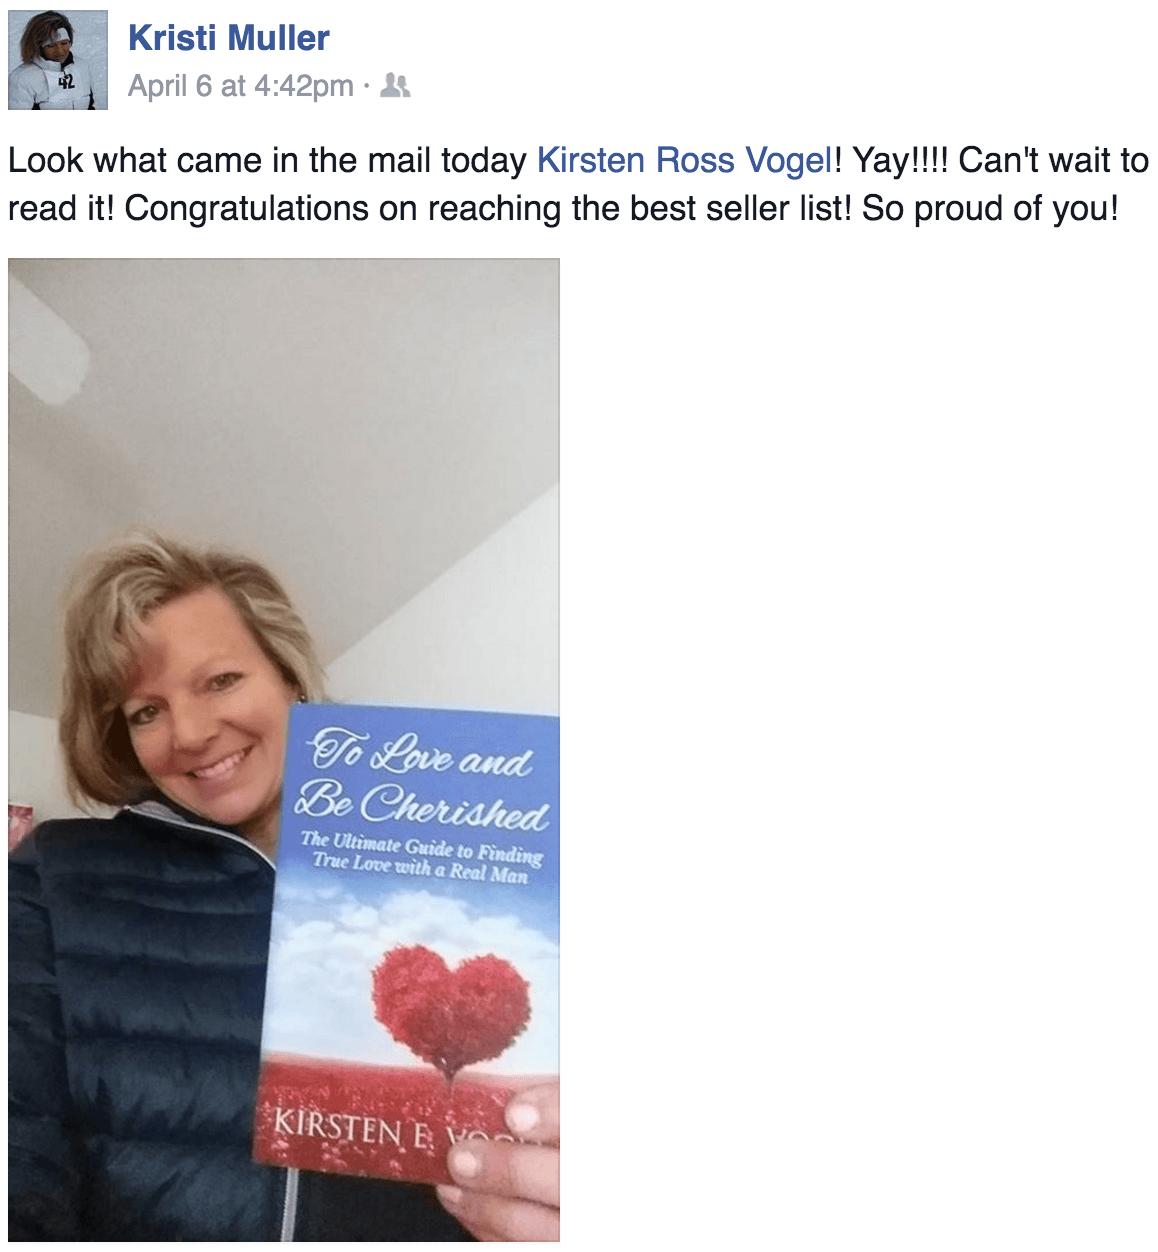 To Love and Be Cherished Book Testimonial Stephanie Rowe Romagnoli